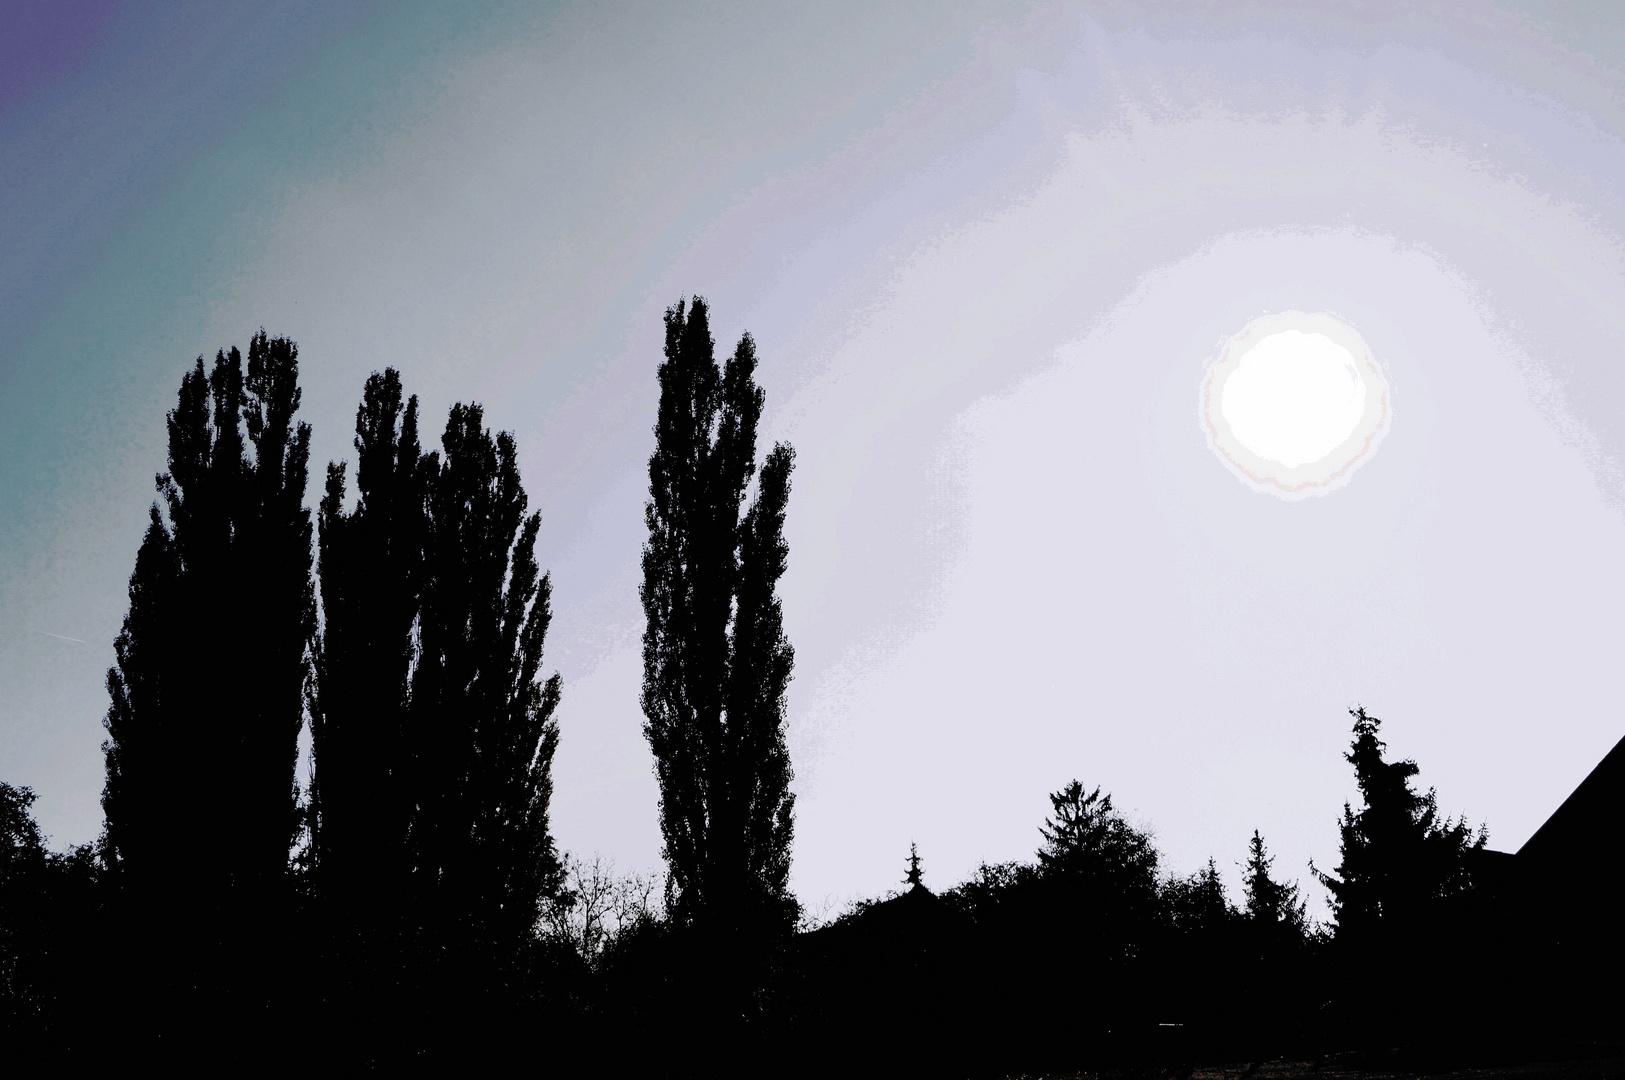 Baum - Silhouette